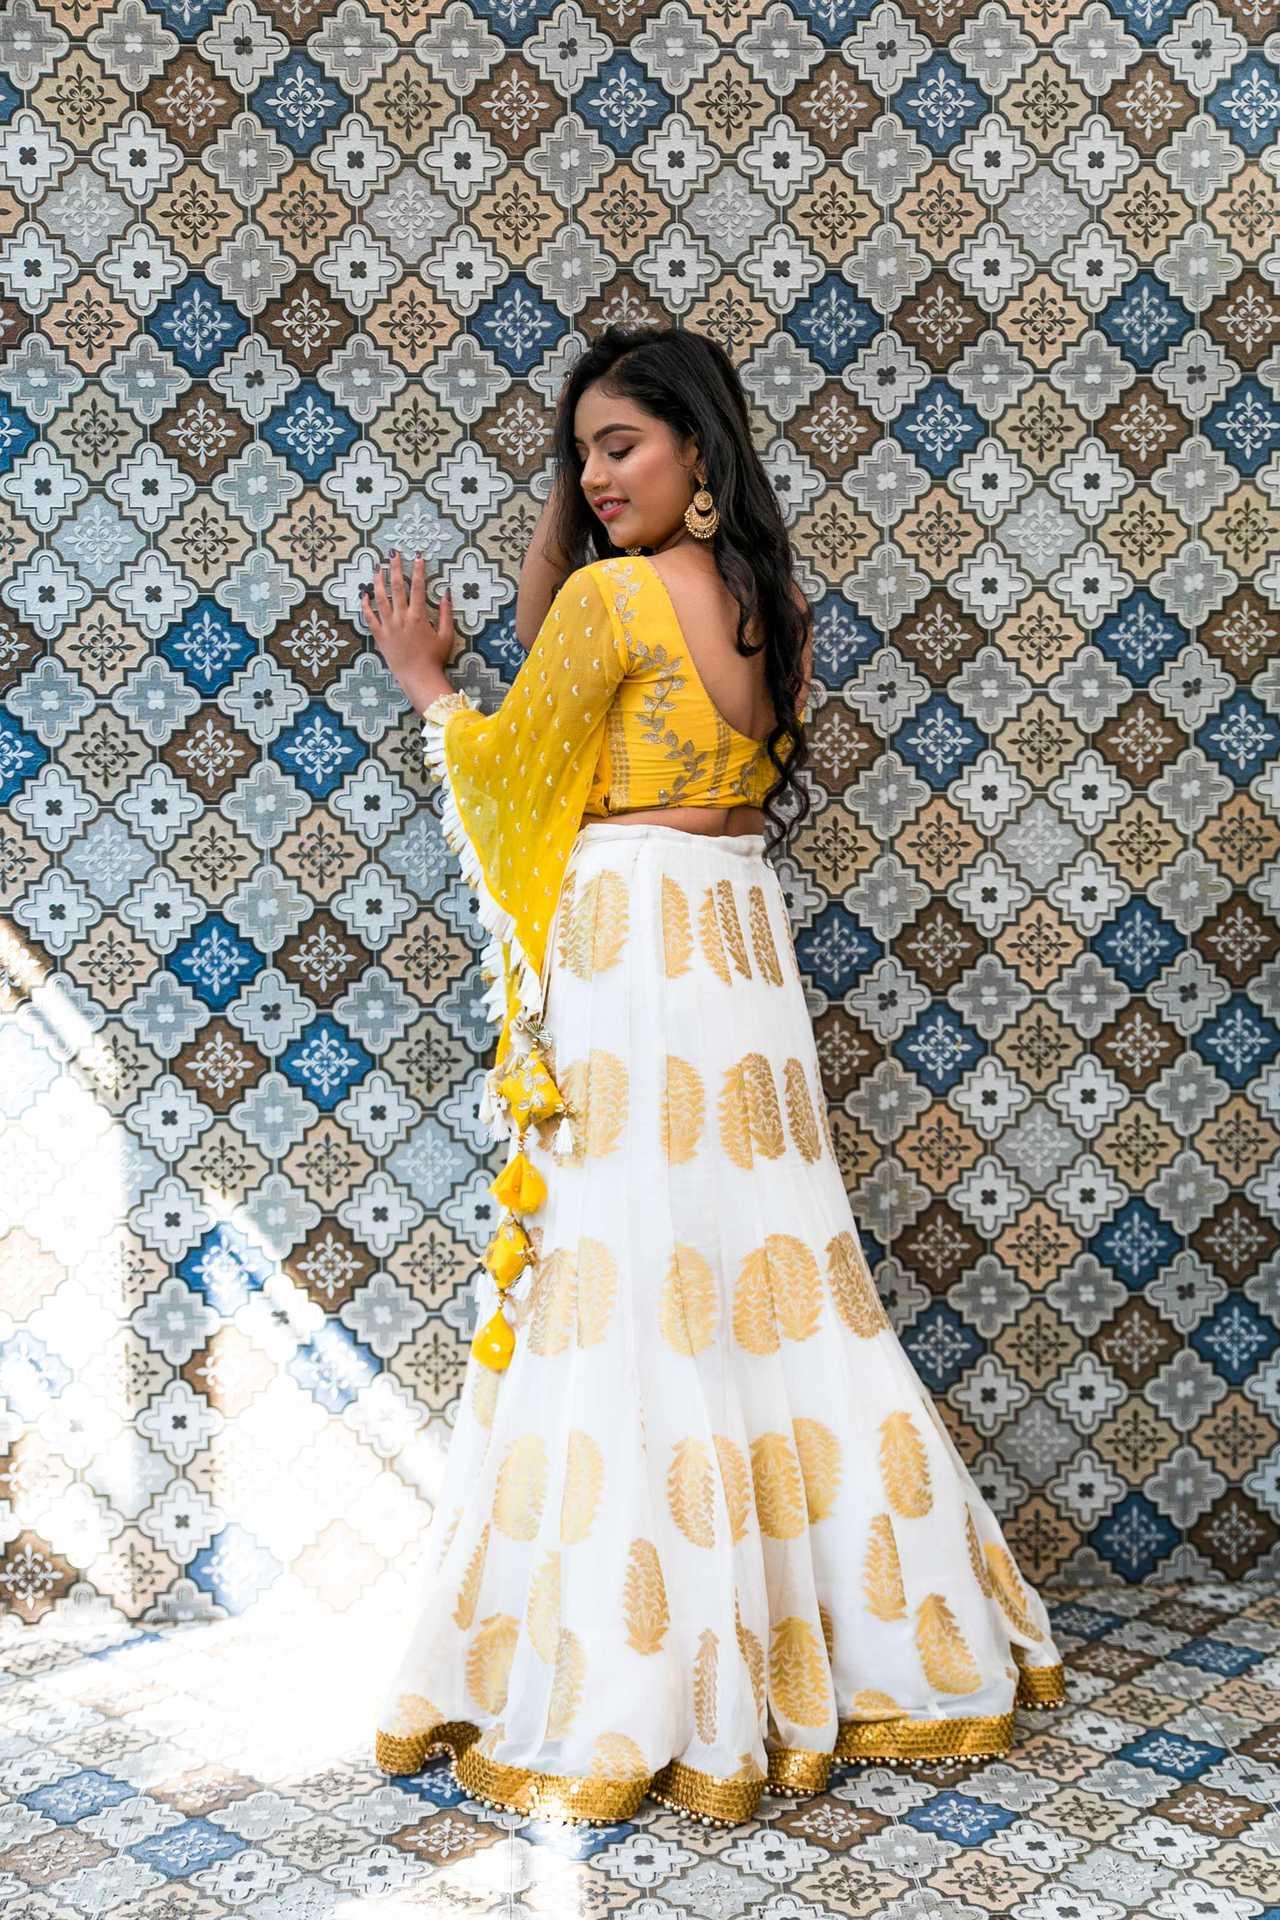 The Fashion Curve by Madhurima - 7J2A1047-1